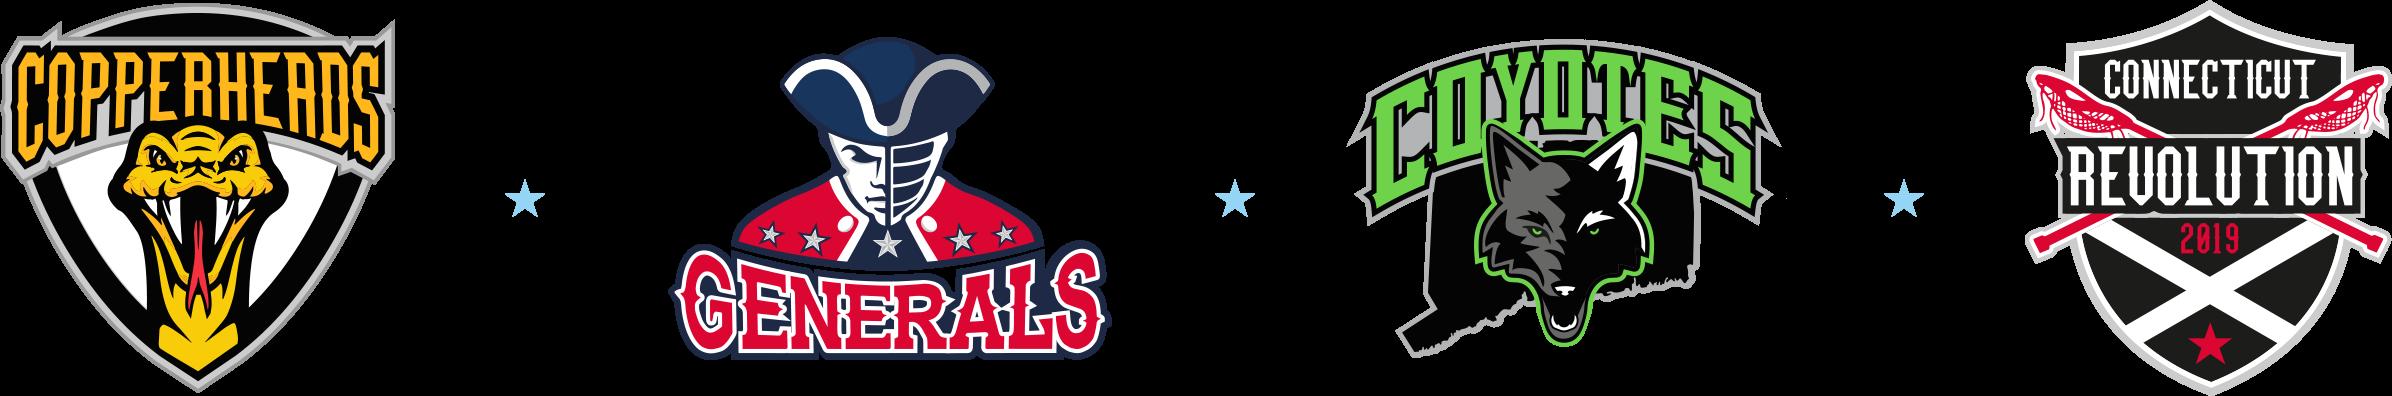 team-logos